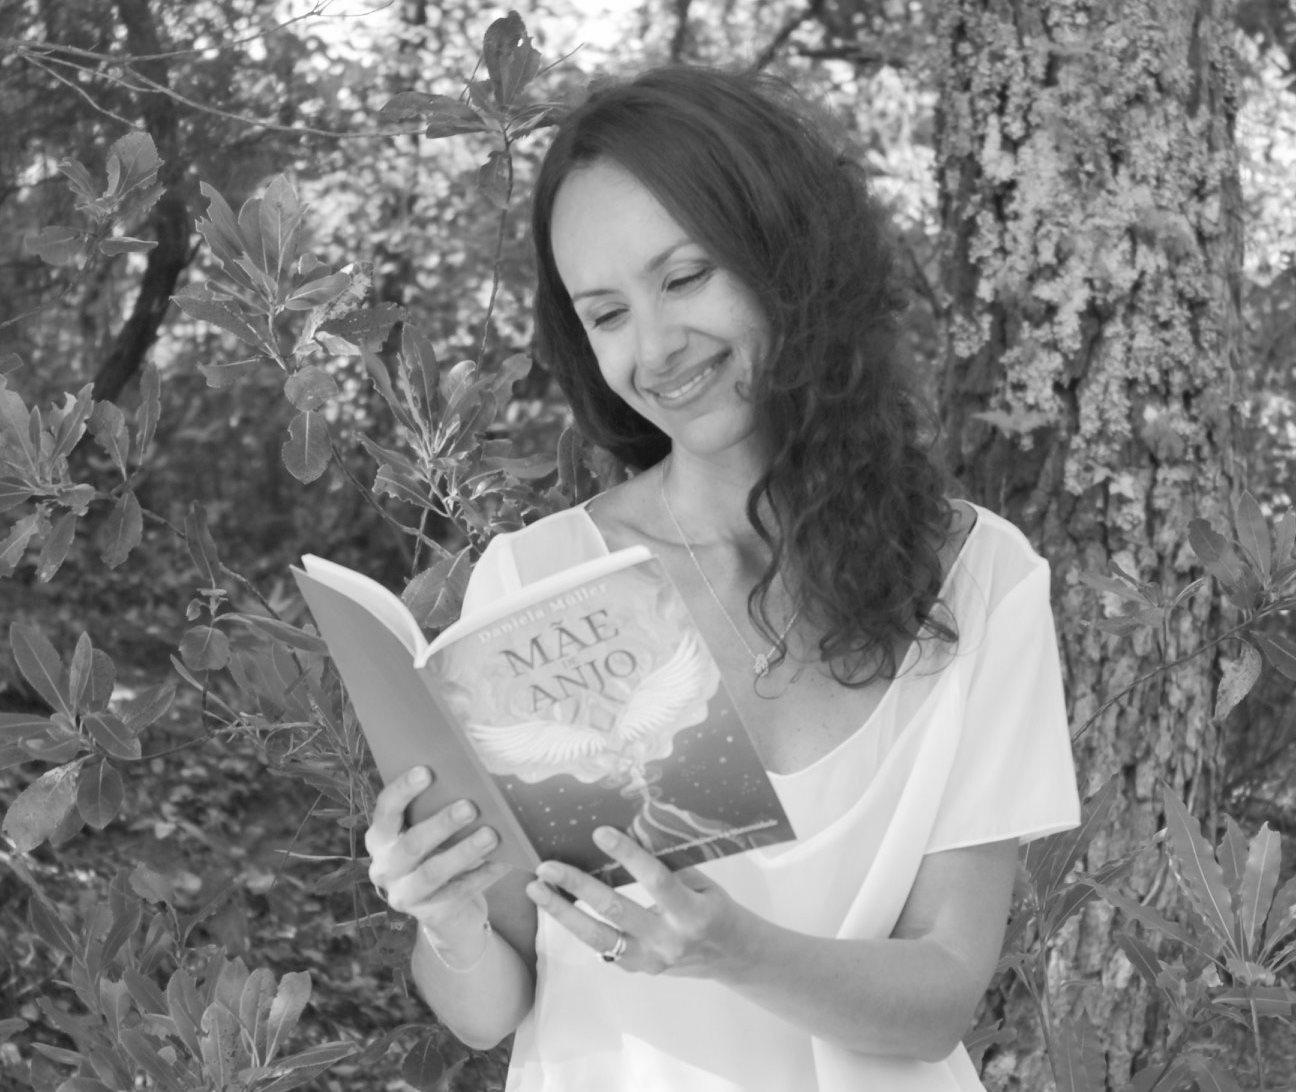 daniela_livro-1